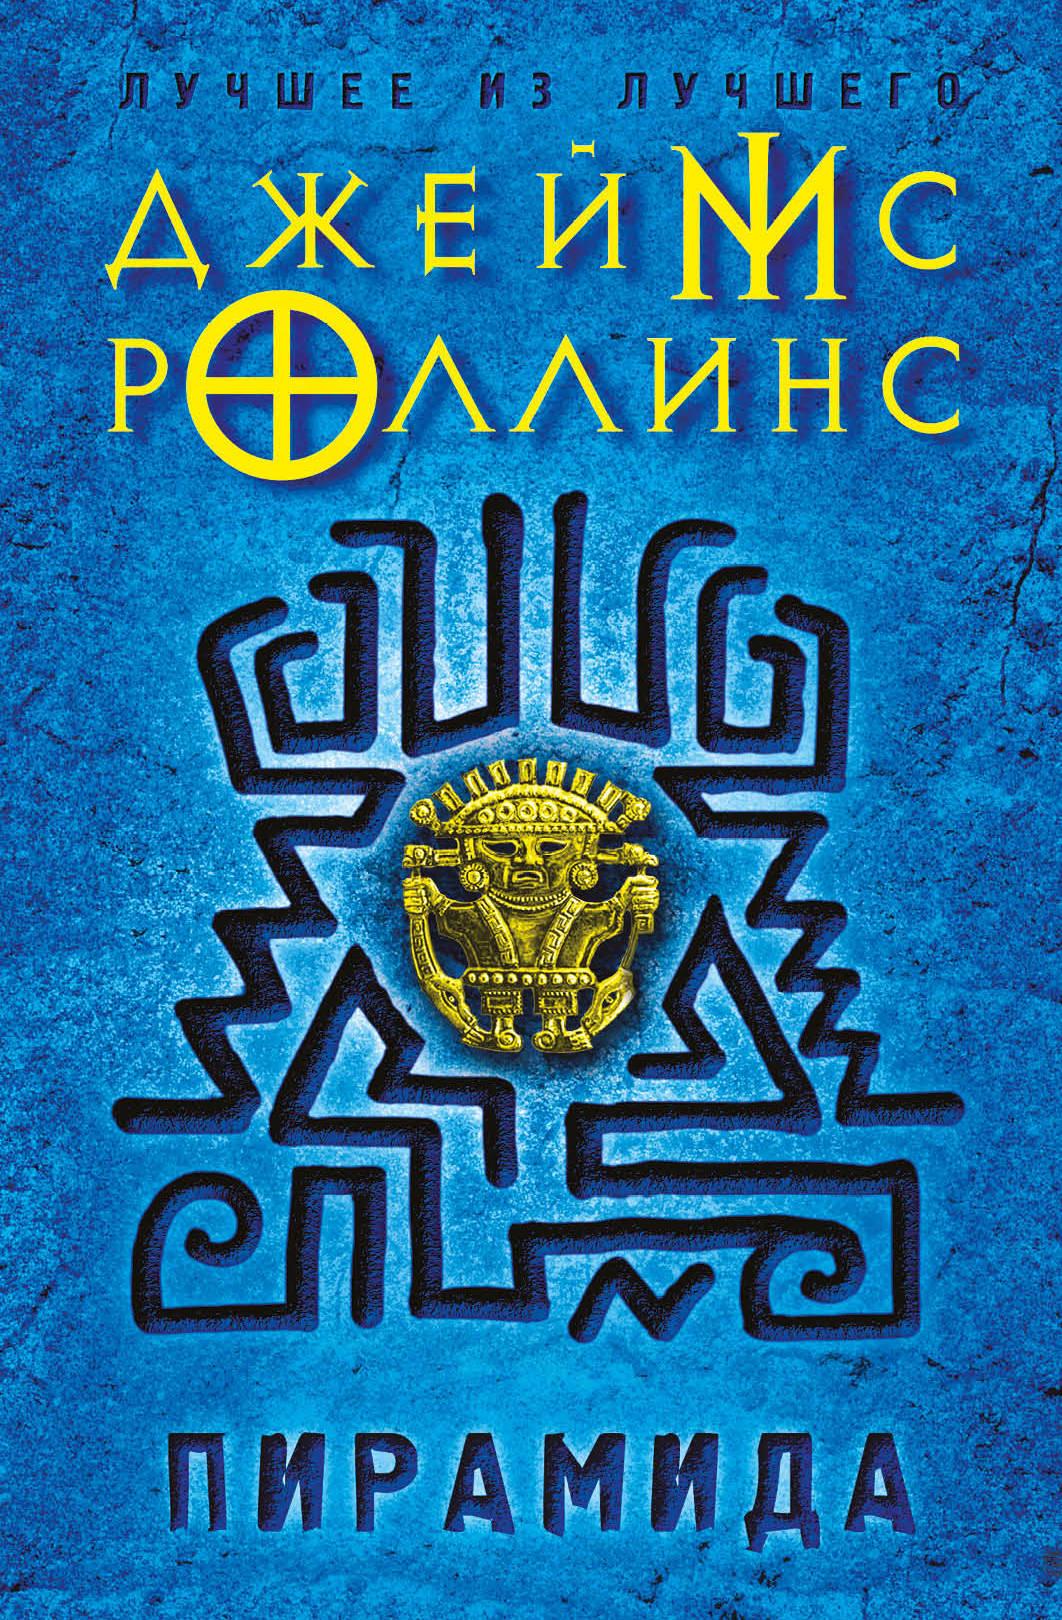 Джеймс Роллинс Пирамида ISBN: 978-5-04-092158-4